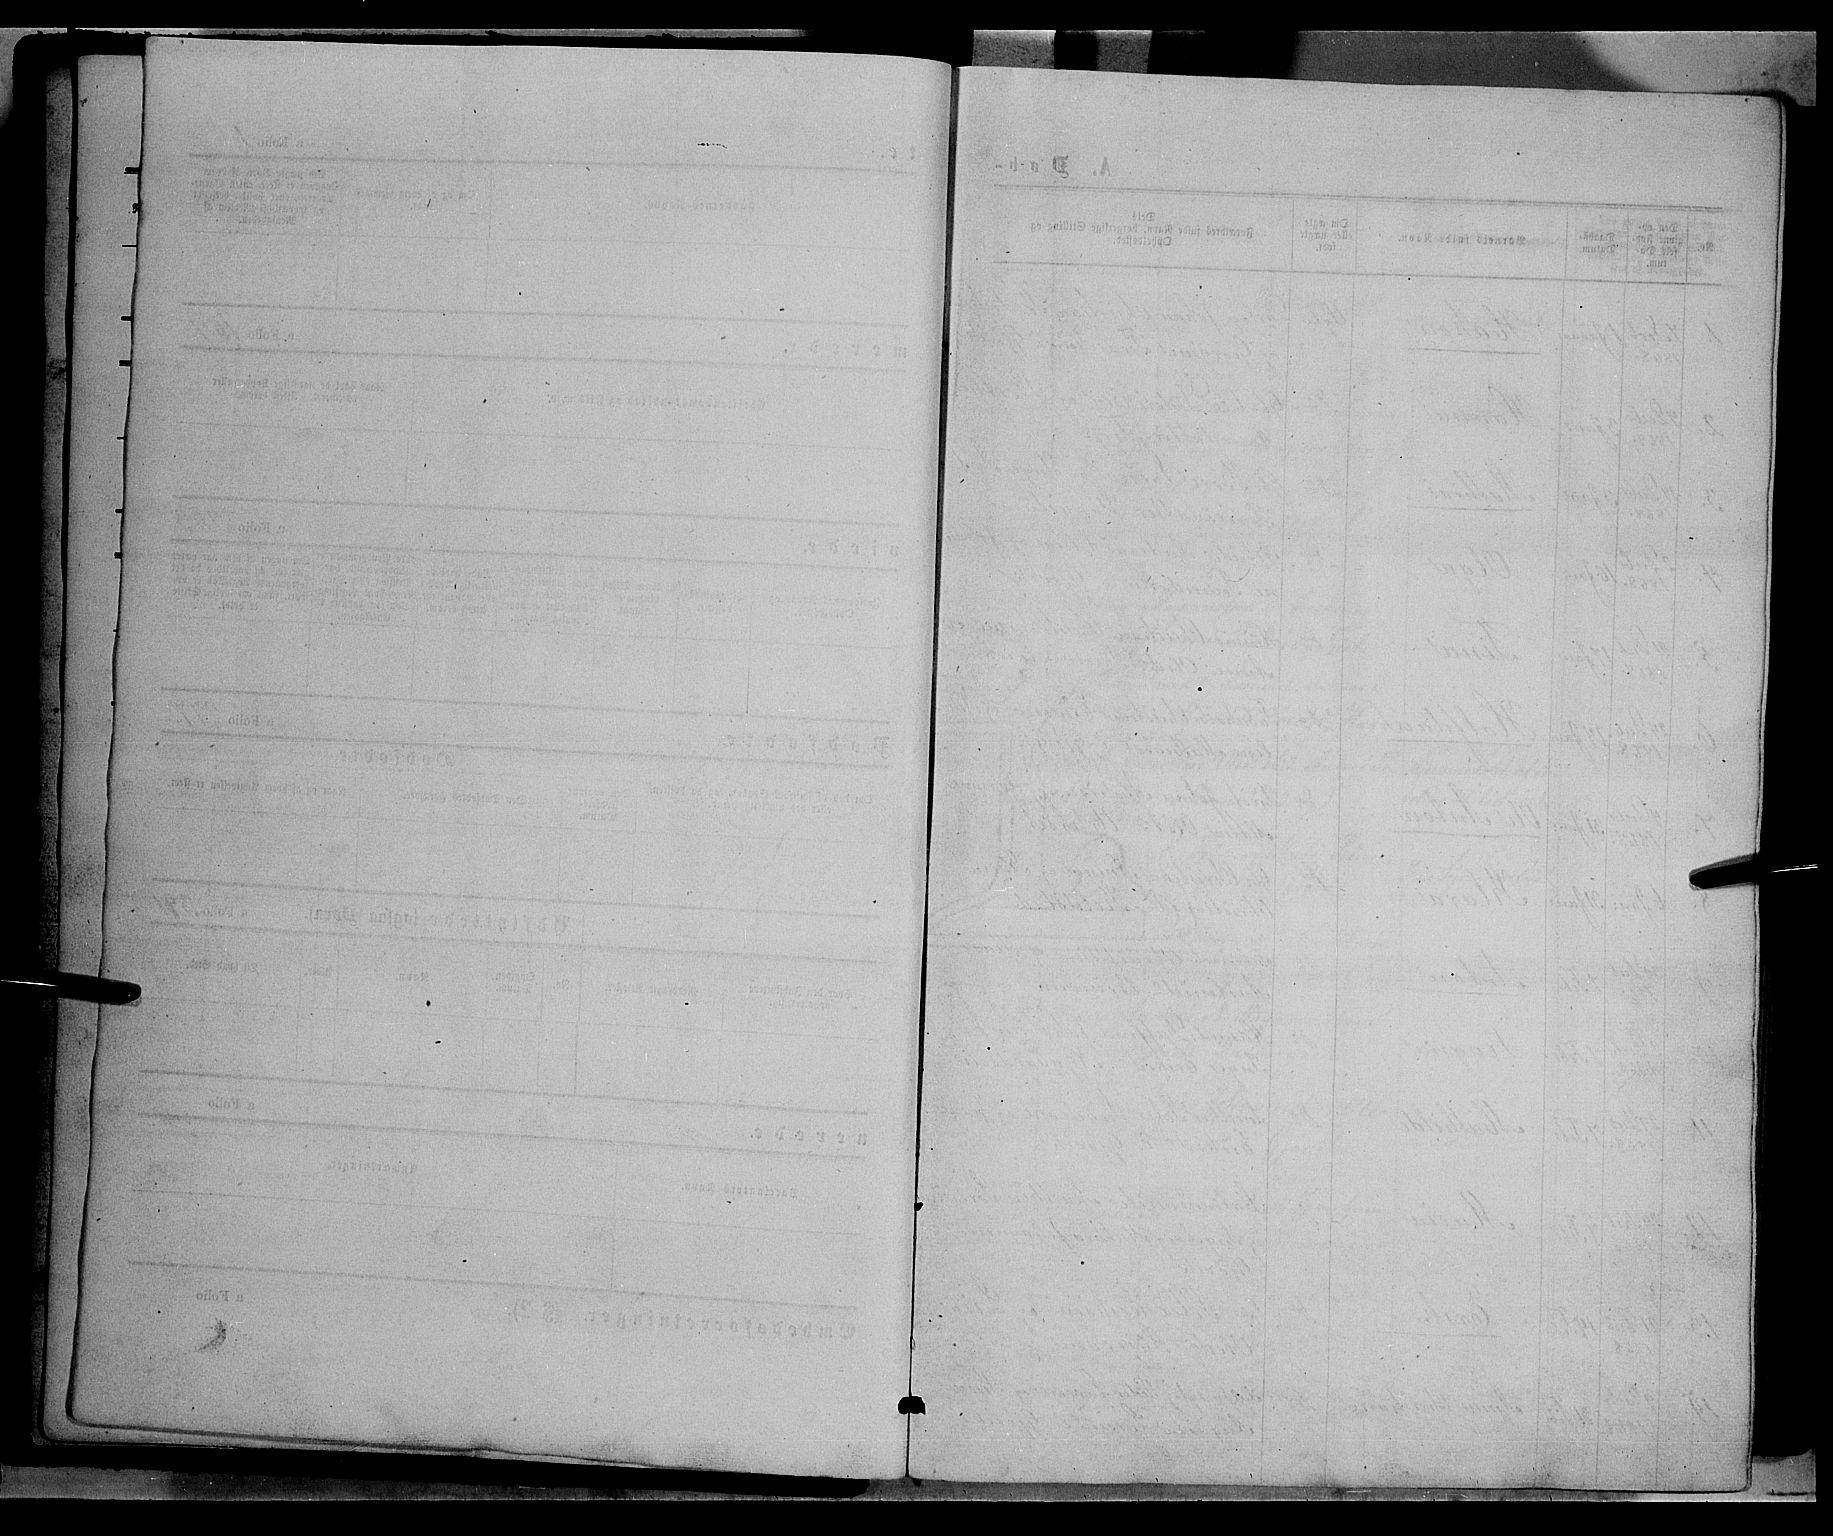 SAH, Vardal prestekontor, H/Ha/Hab/L0006: Klokkerbok nr. 6, 1869-1881